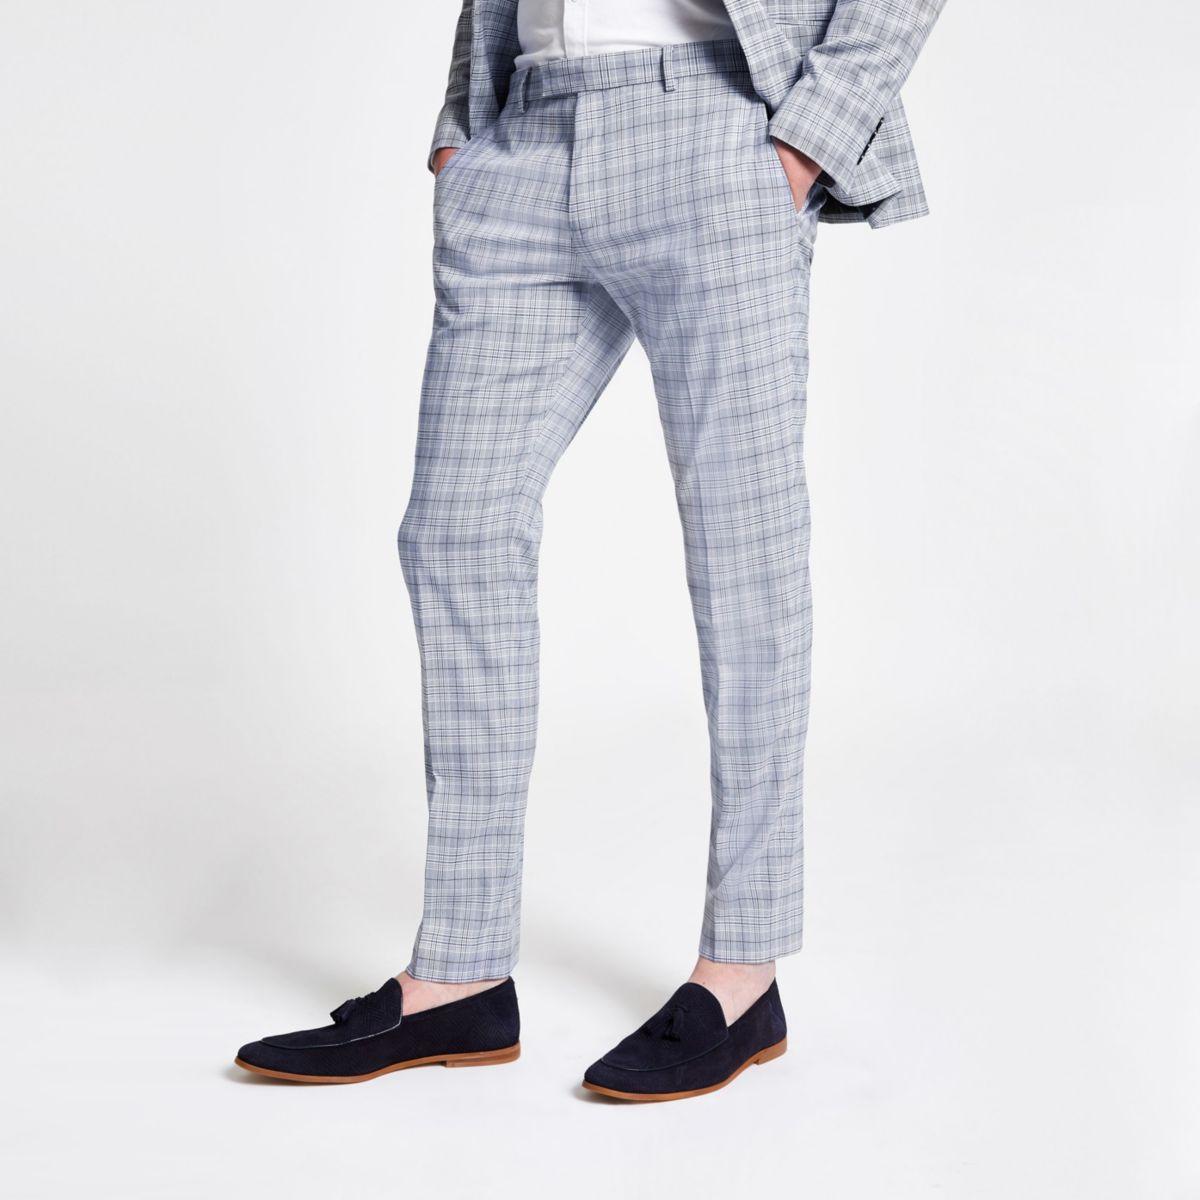 Blue check skinny suit pants